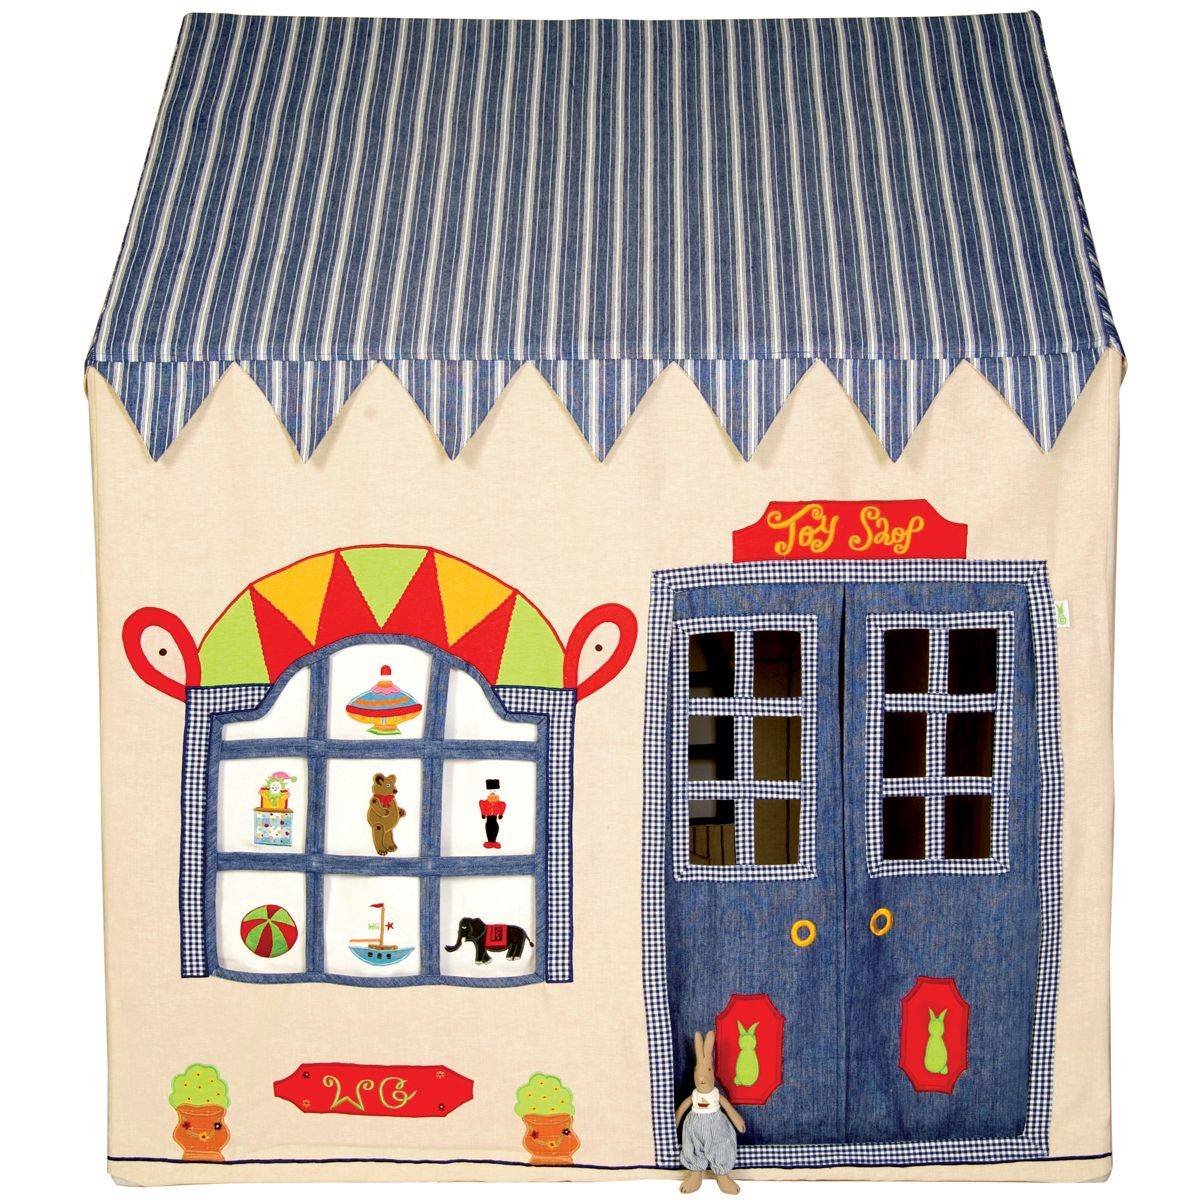 Children's Playhouses & Accessories